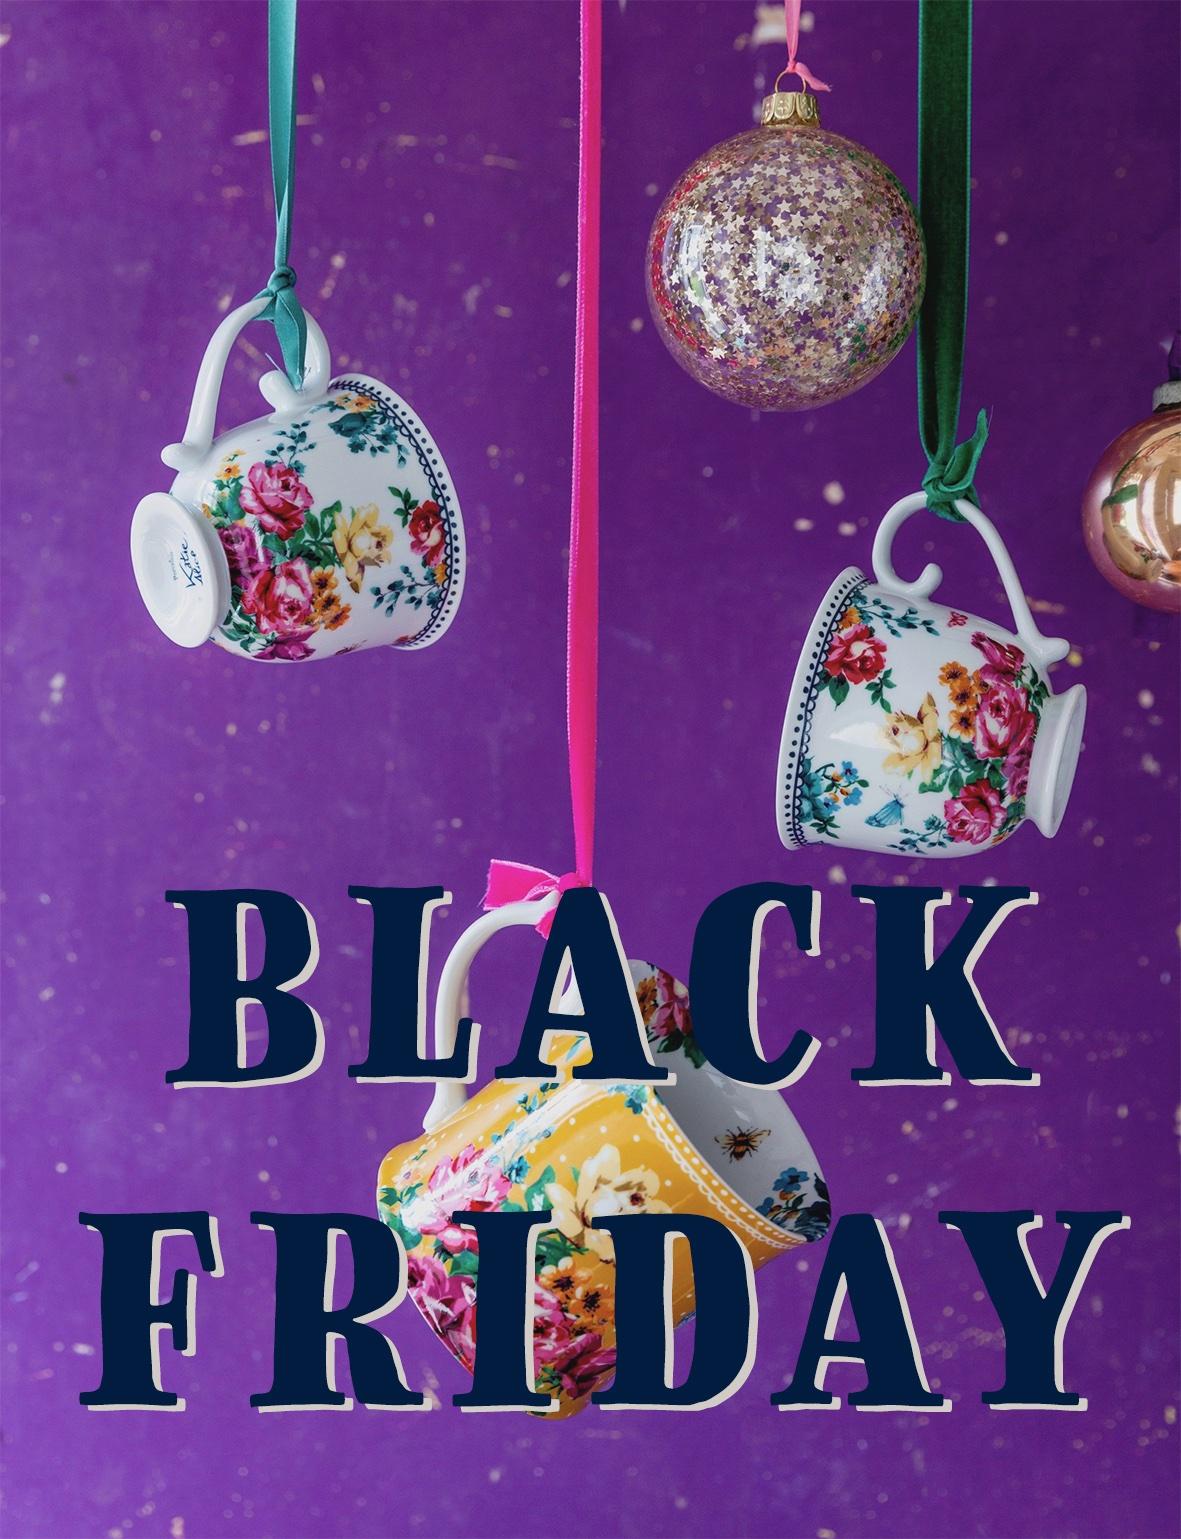 A Charitable Black Friday